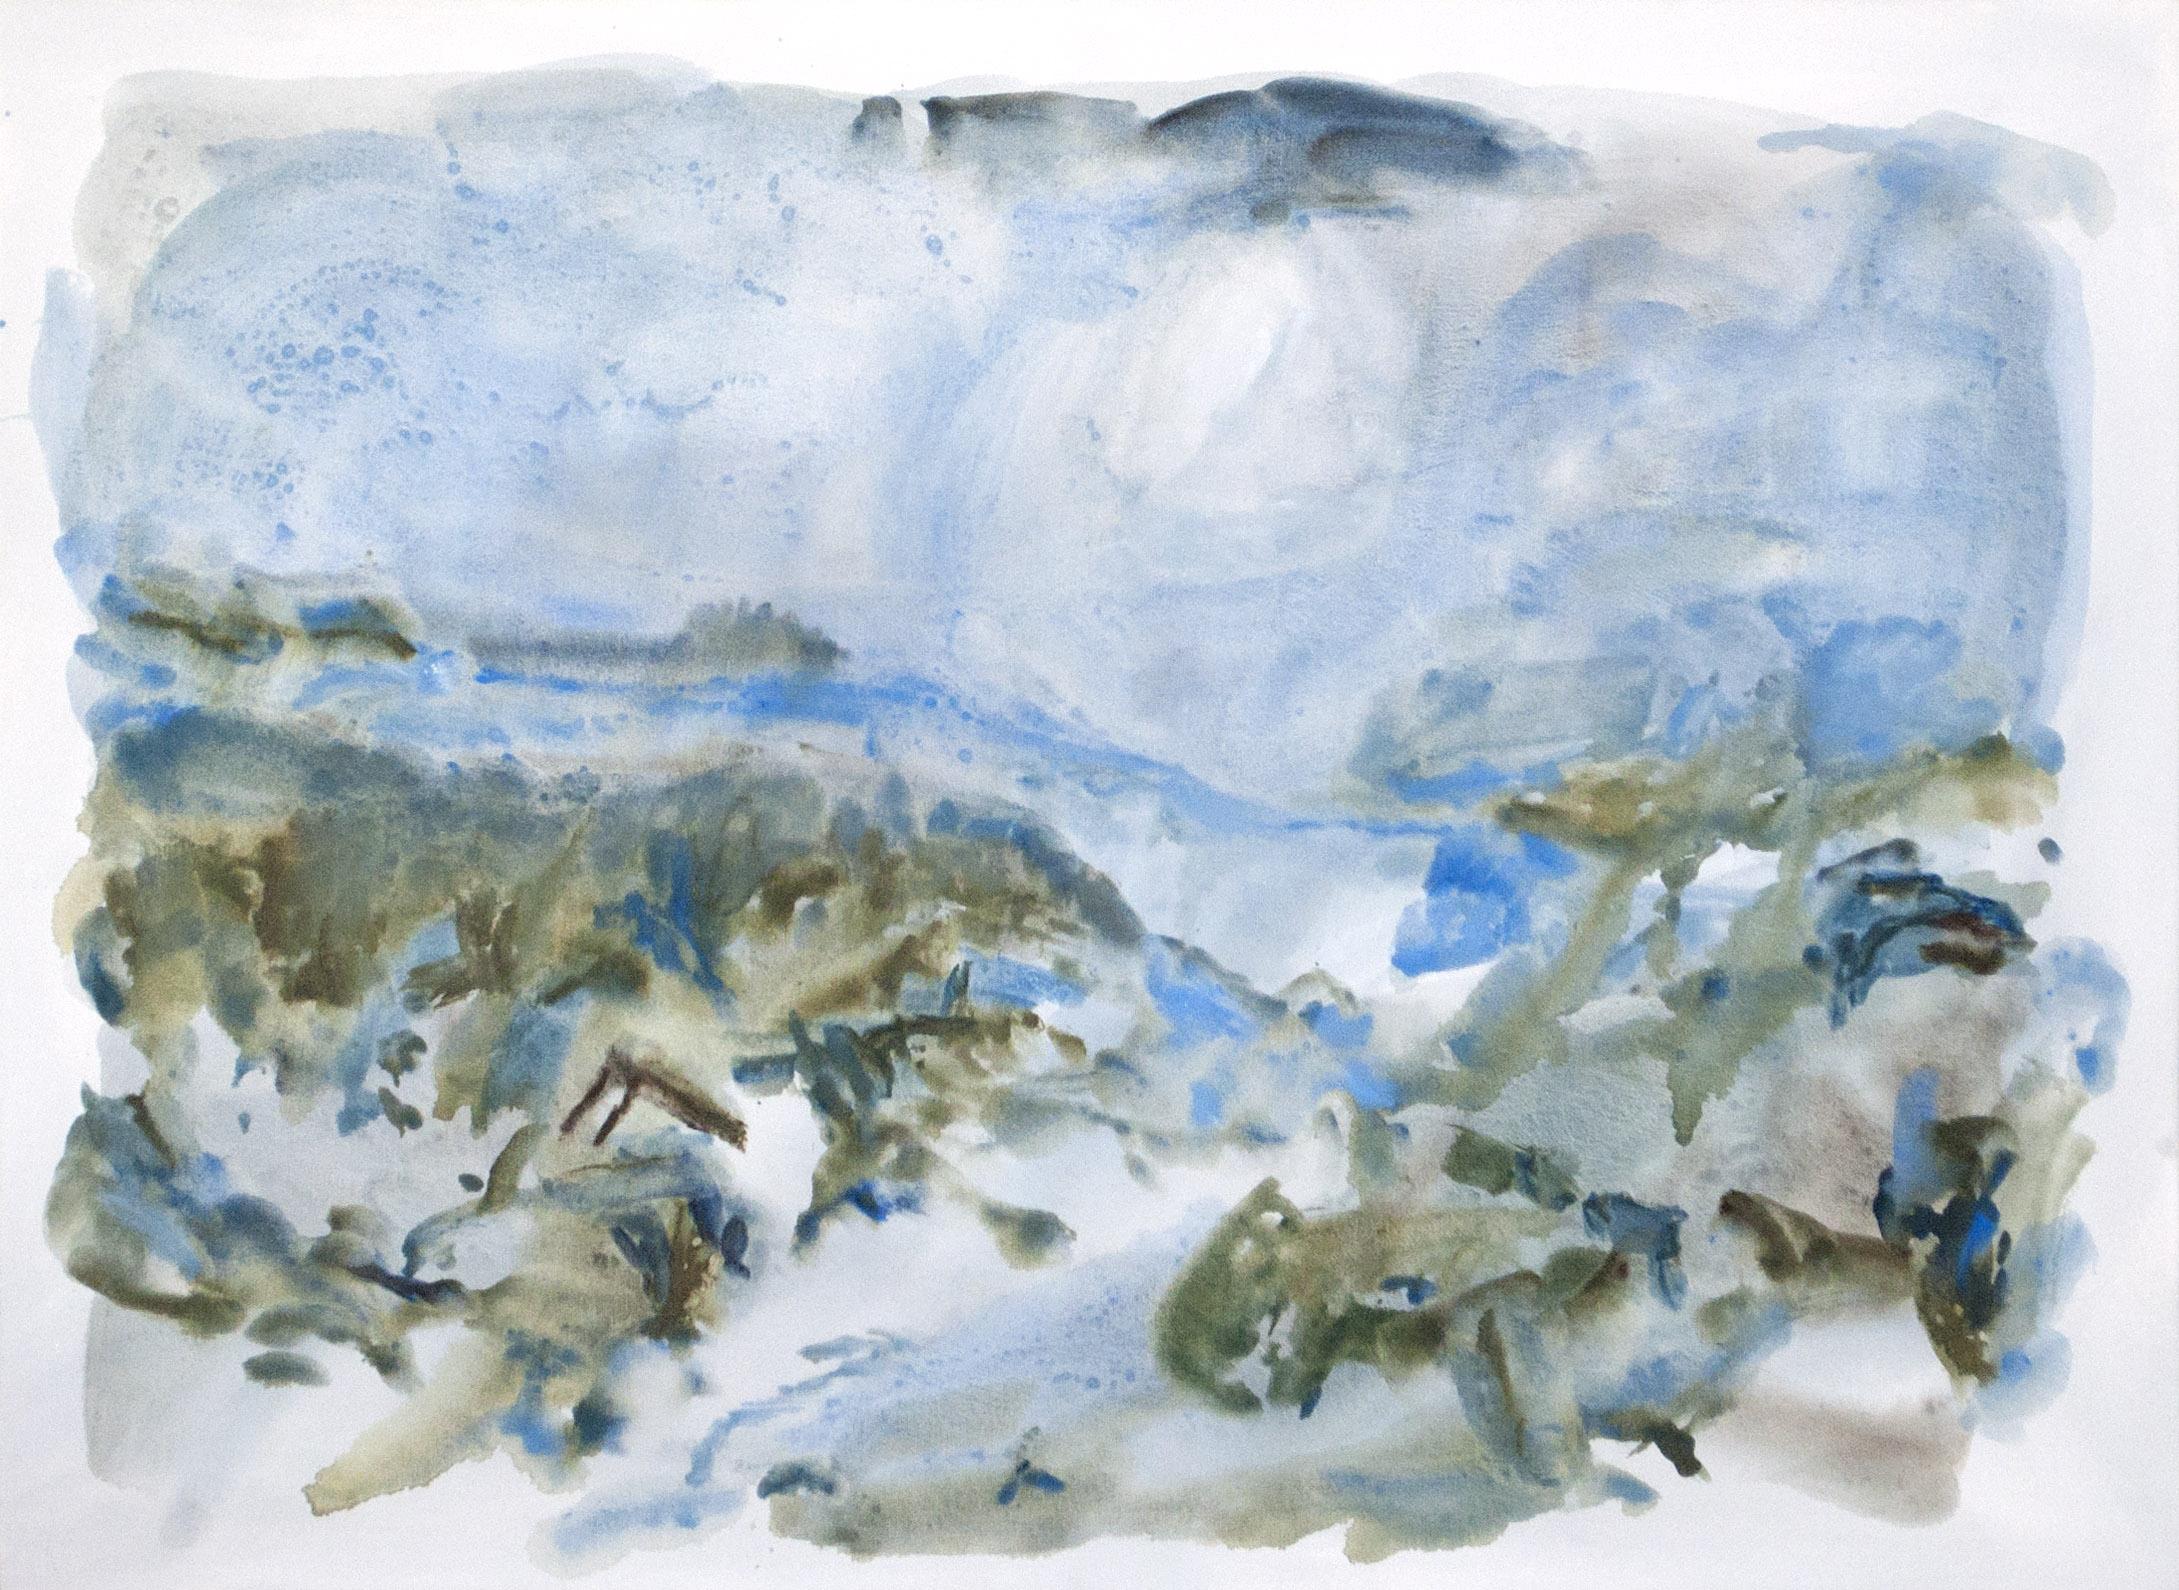 Marais Don Quichotte 2/3, gouache and acrylic on canvas, 76 x 102 cm, 2016